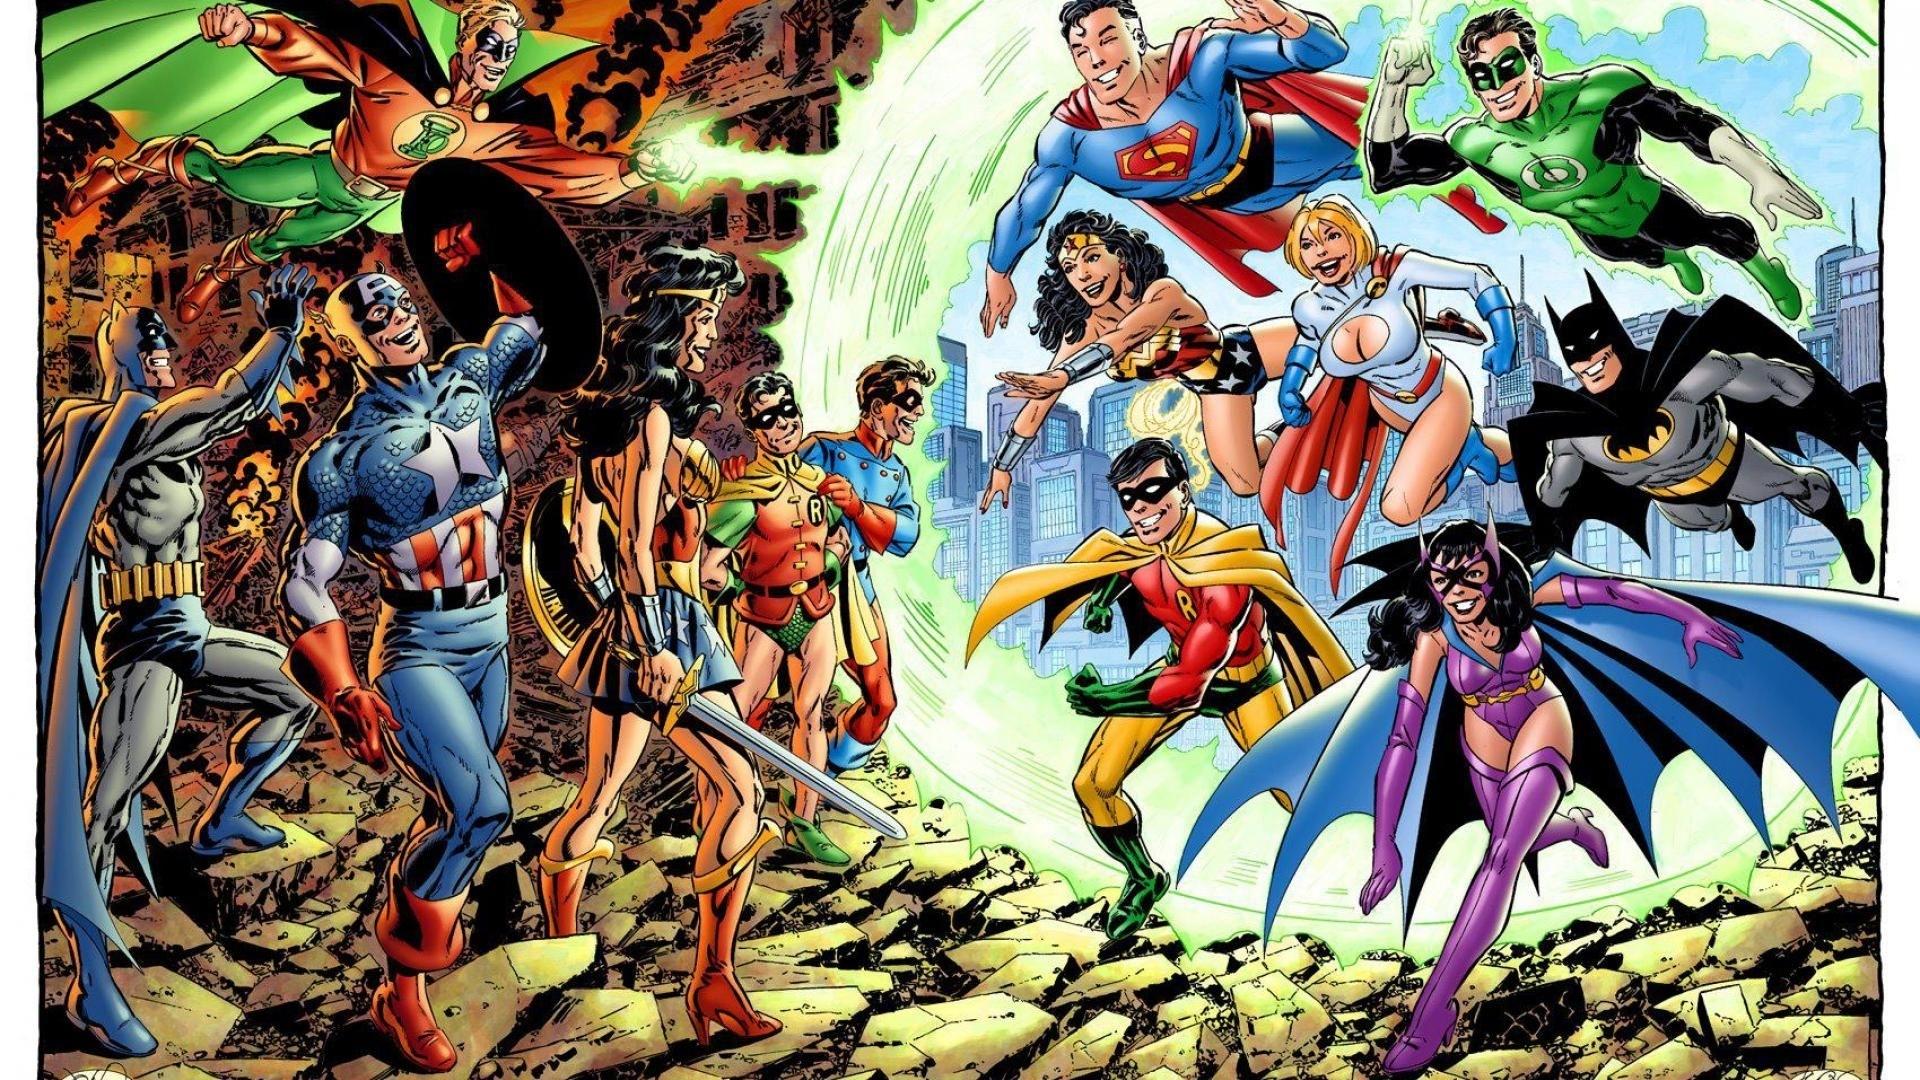 marvel vs dc wallpapers wallpaper | wallpapers for desktop